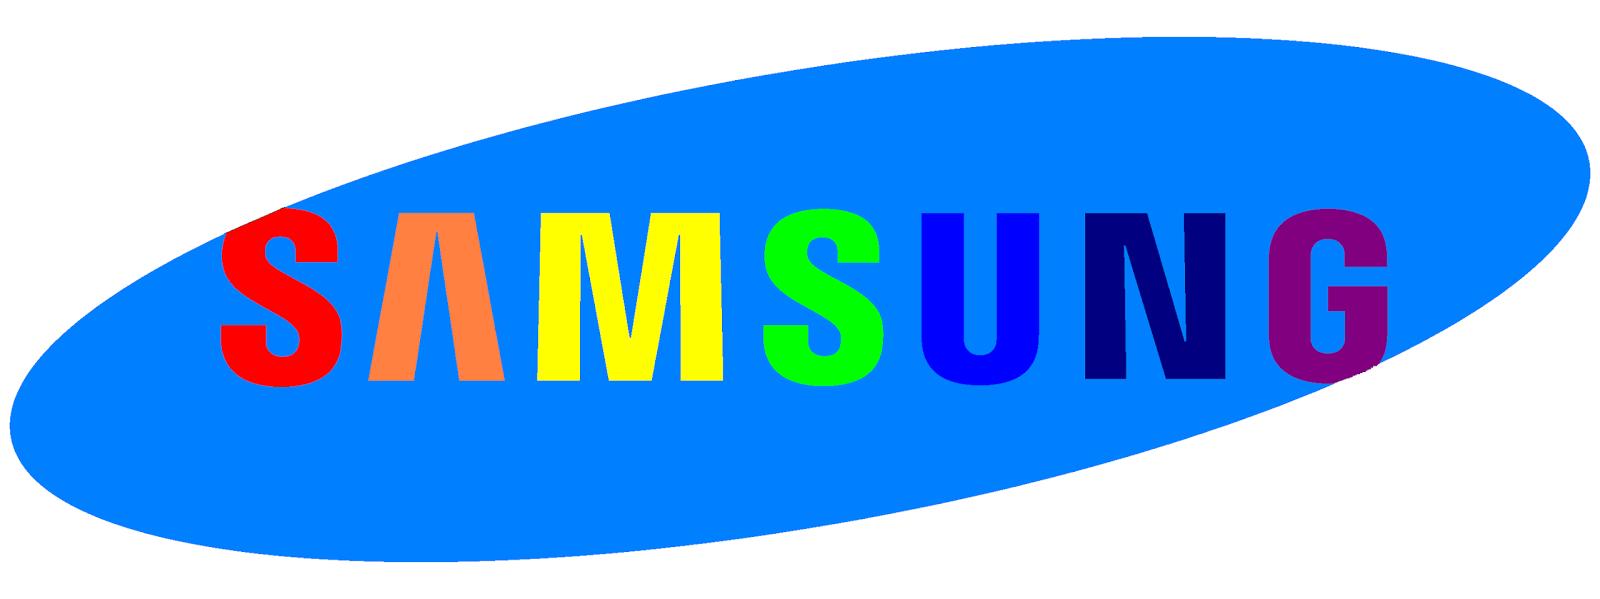 Samsung Galaxy J2 Wallpaper Modi Logo: Gsm Natore: Samsung GT-I9300.cert..&..EFS File (100%) Tested